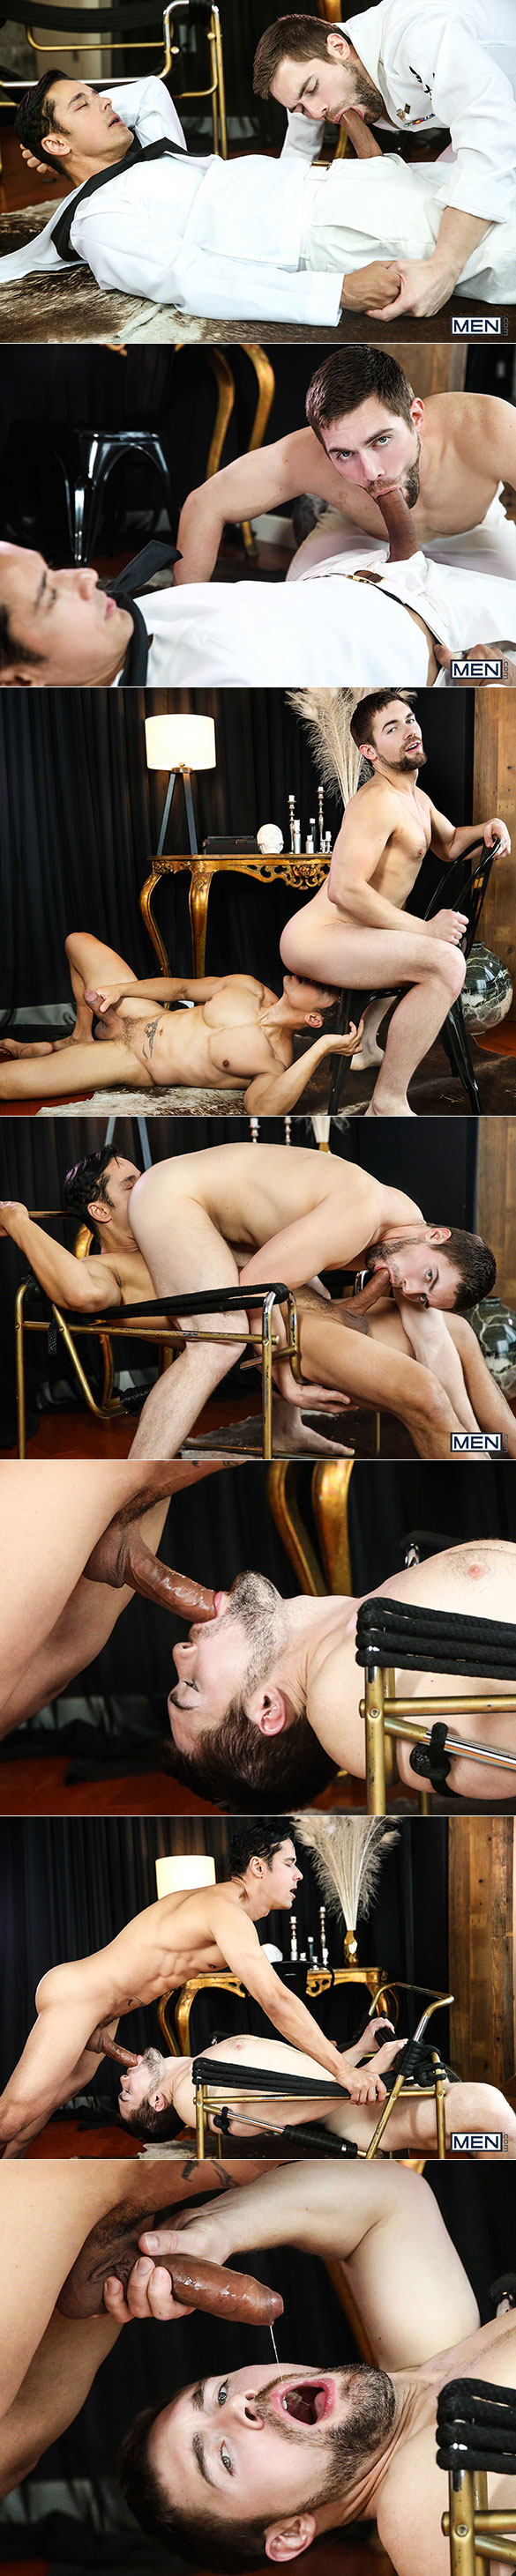 "Men.com: Big-dicked Rafael Alencar bangs Griffin Barrows in ""Fleet Week, Part 1"""